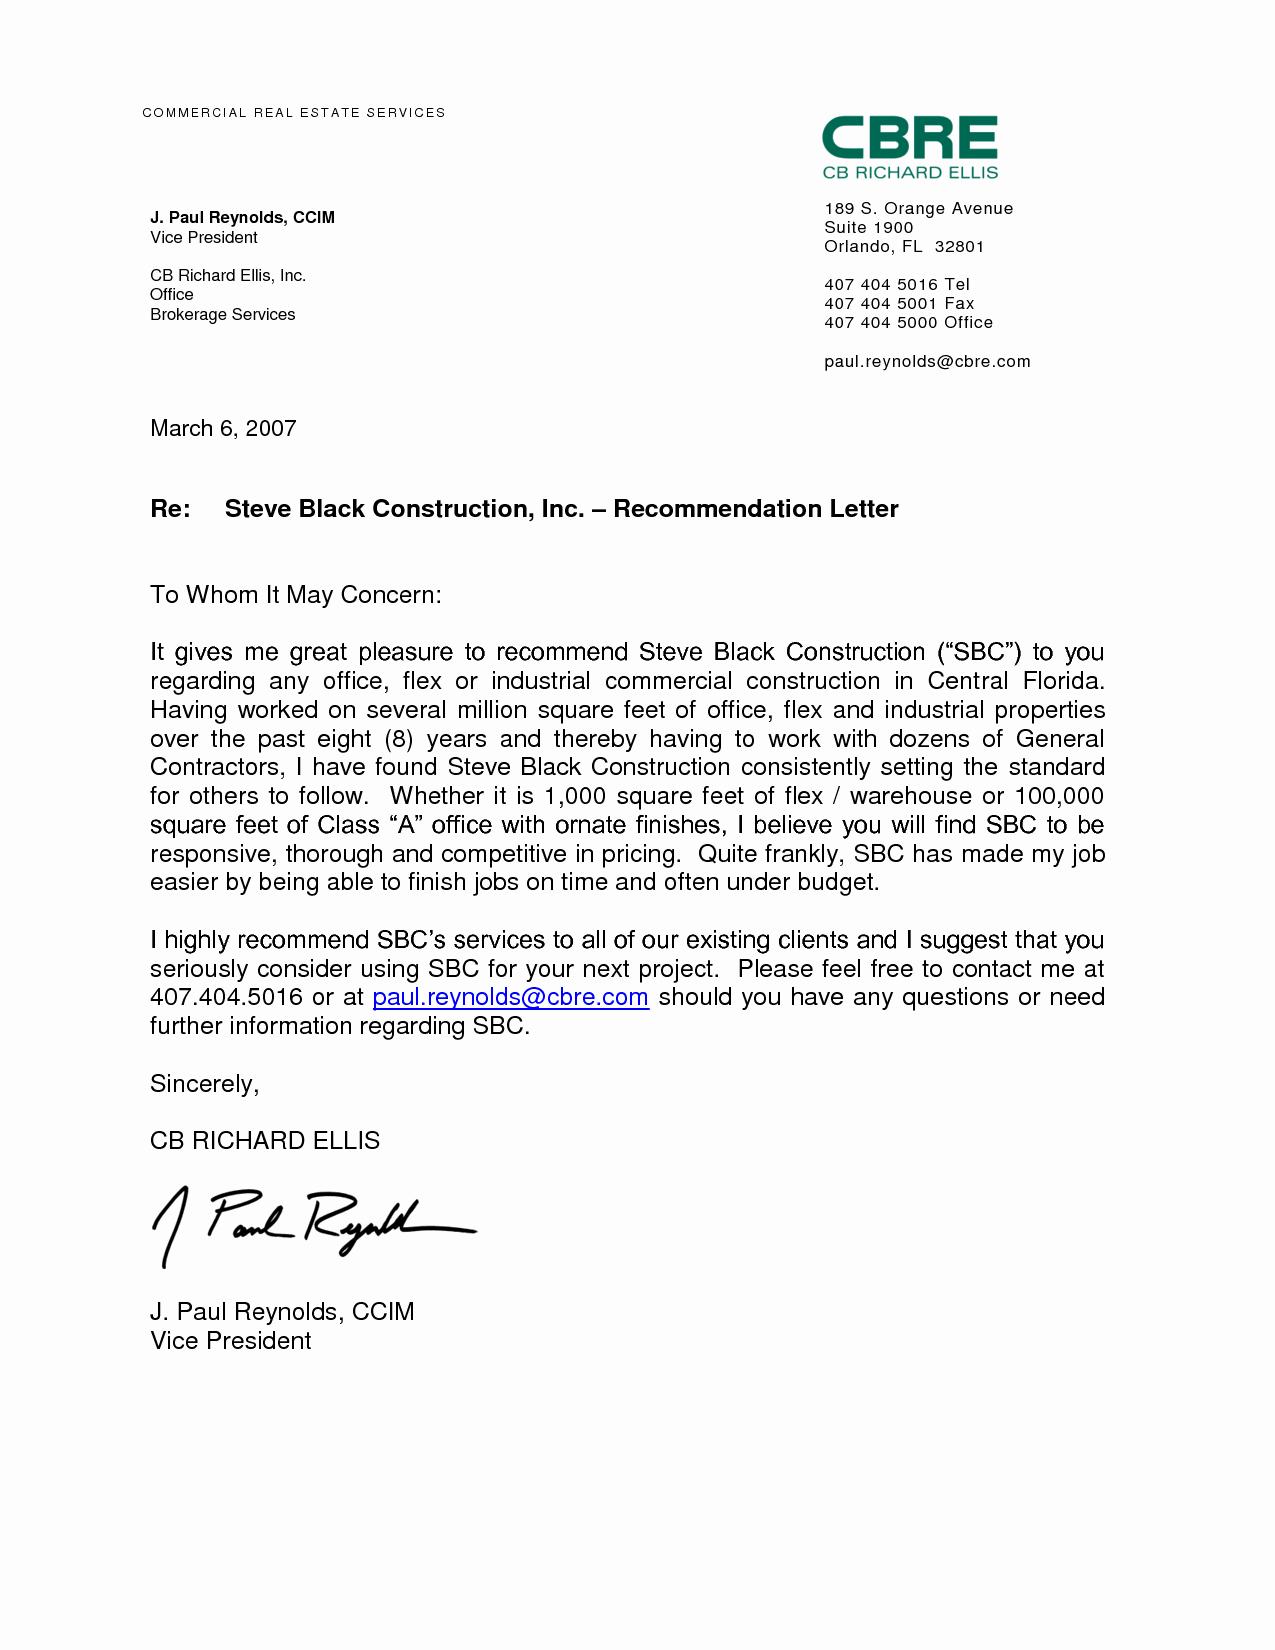 Referral Letter Sample for Employment Fresh Reference Letter for A Job Best Letter